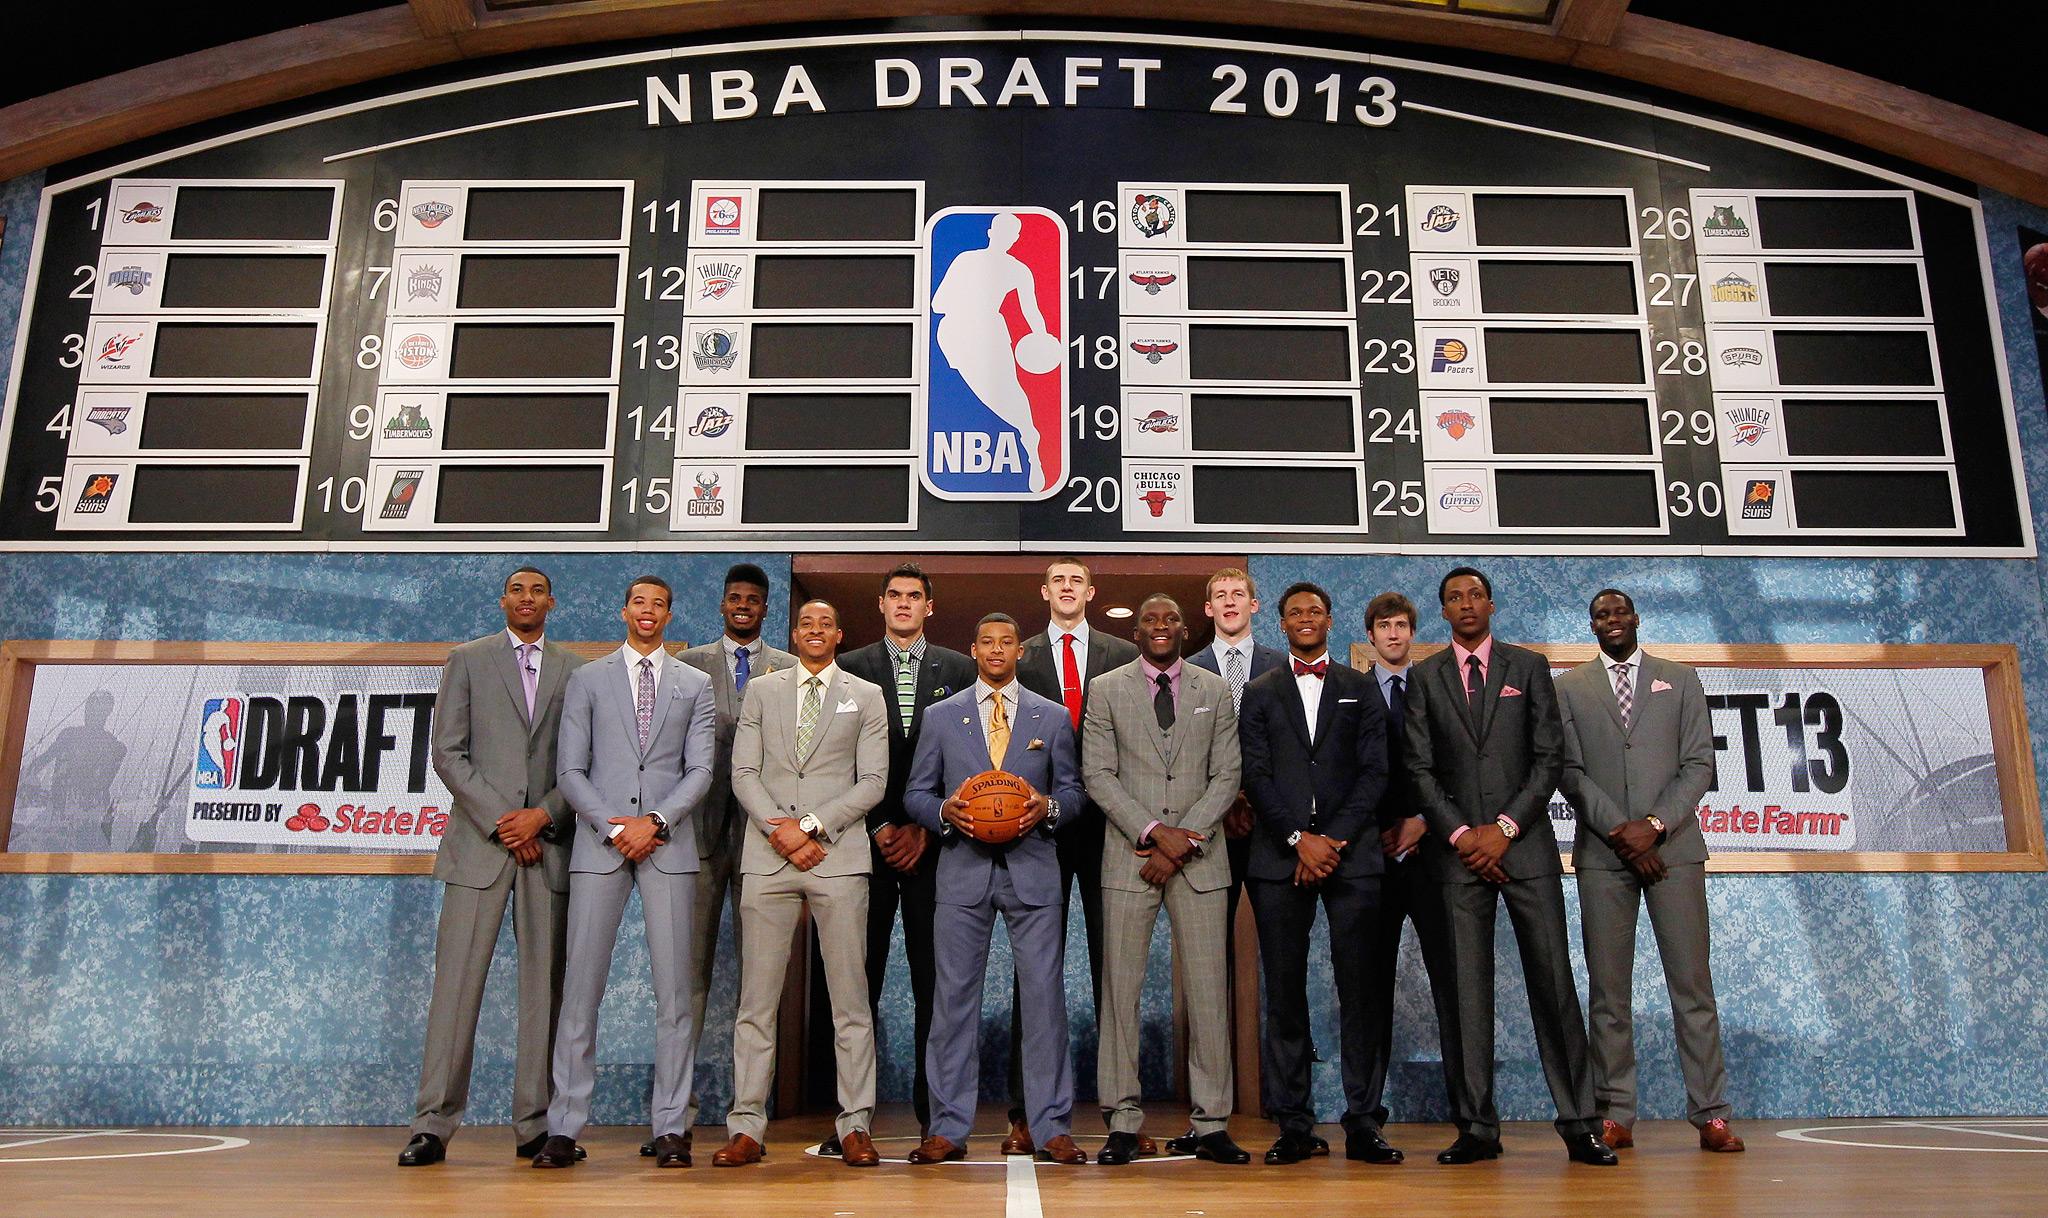 Les probabilités officielles de la Draft 2016